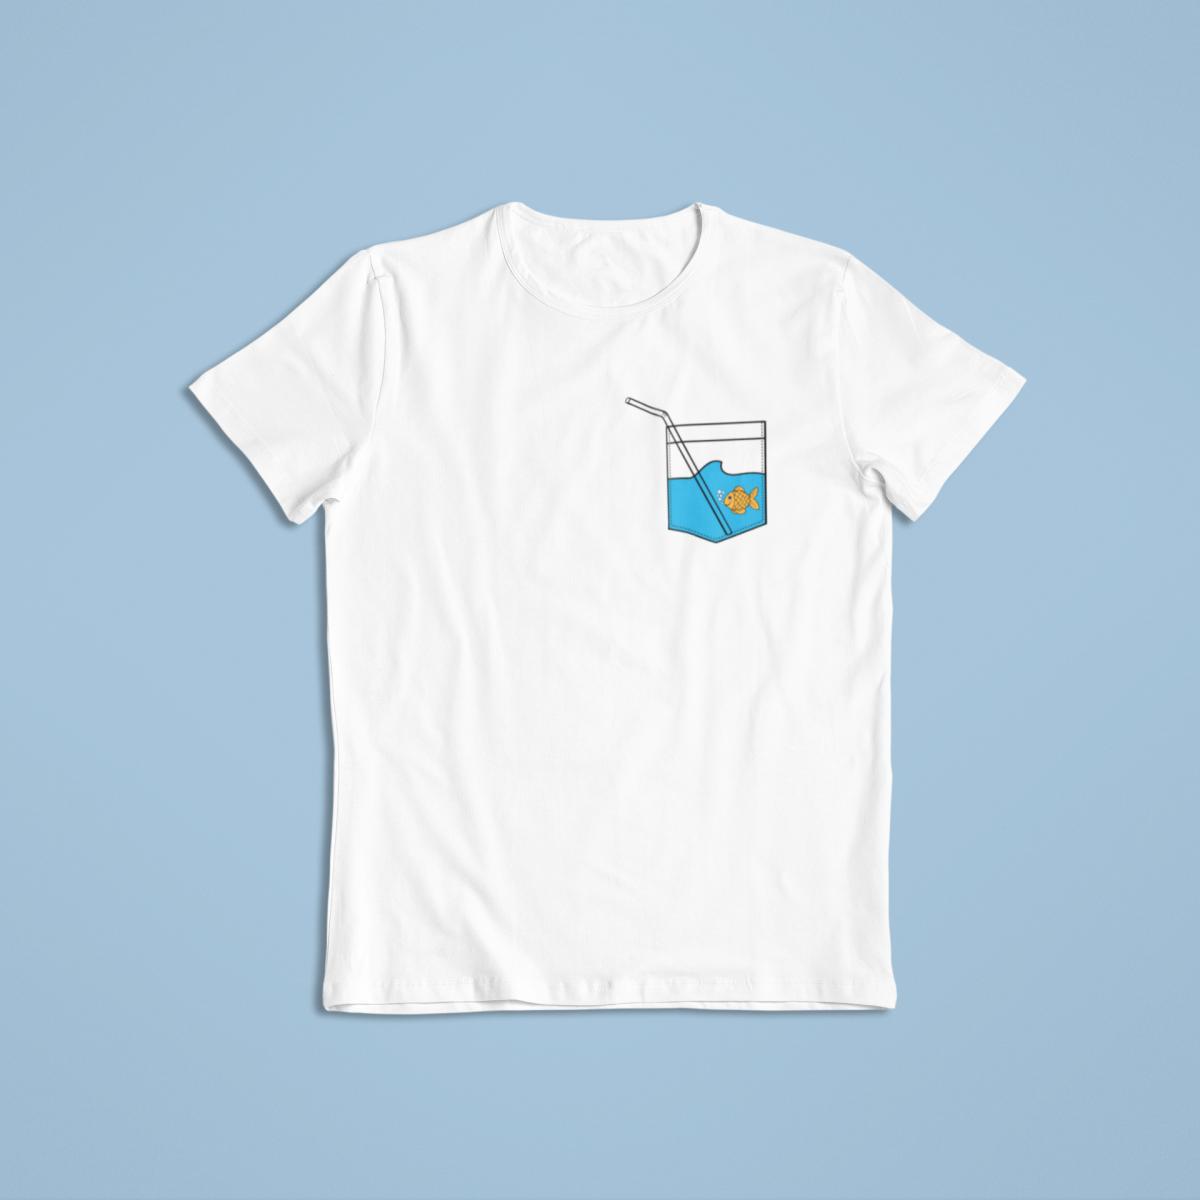 ZUIG shirt 'Visje'